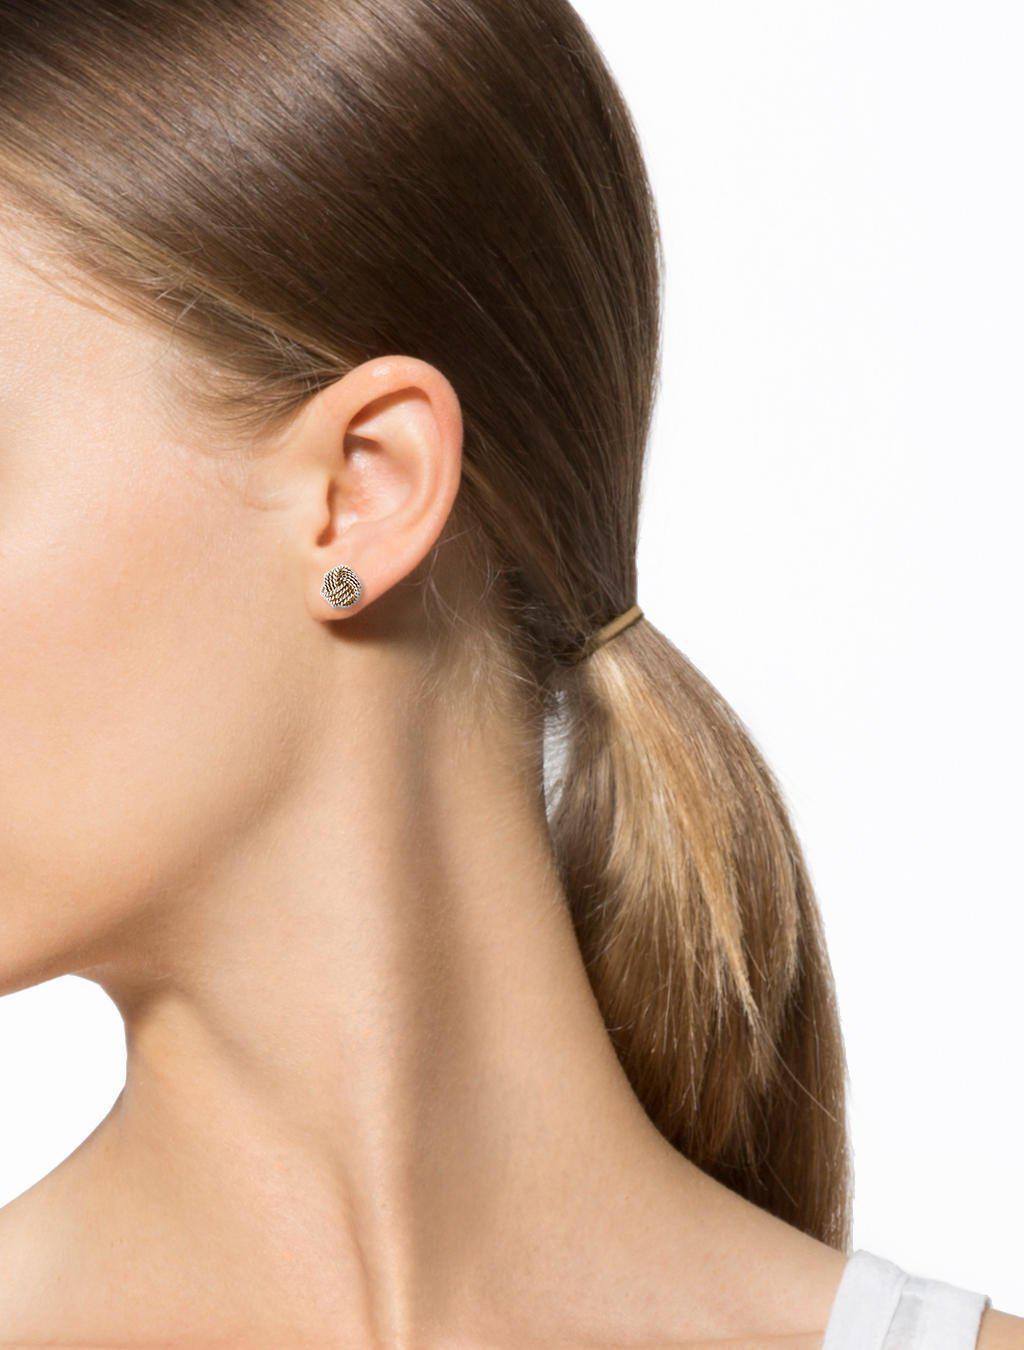 00e2a693dd08b Tiffany Silver Knot Earrings - Best All Earring Photos Kamilmaciol.Com